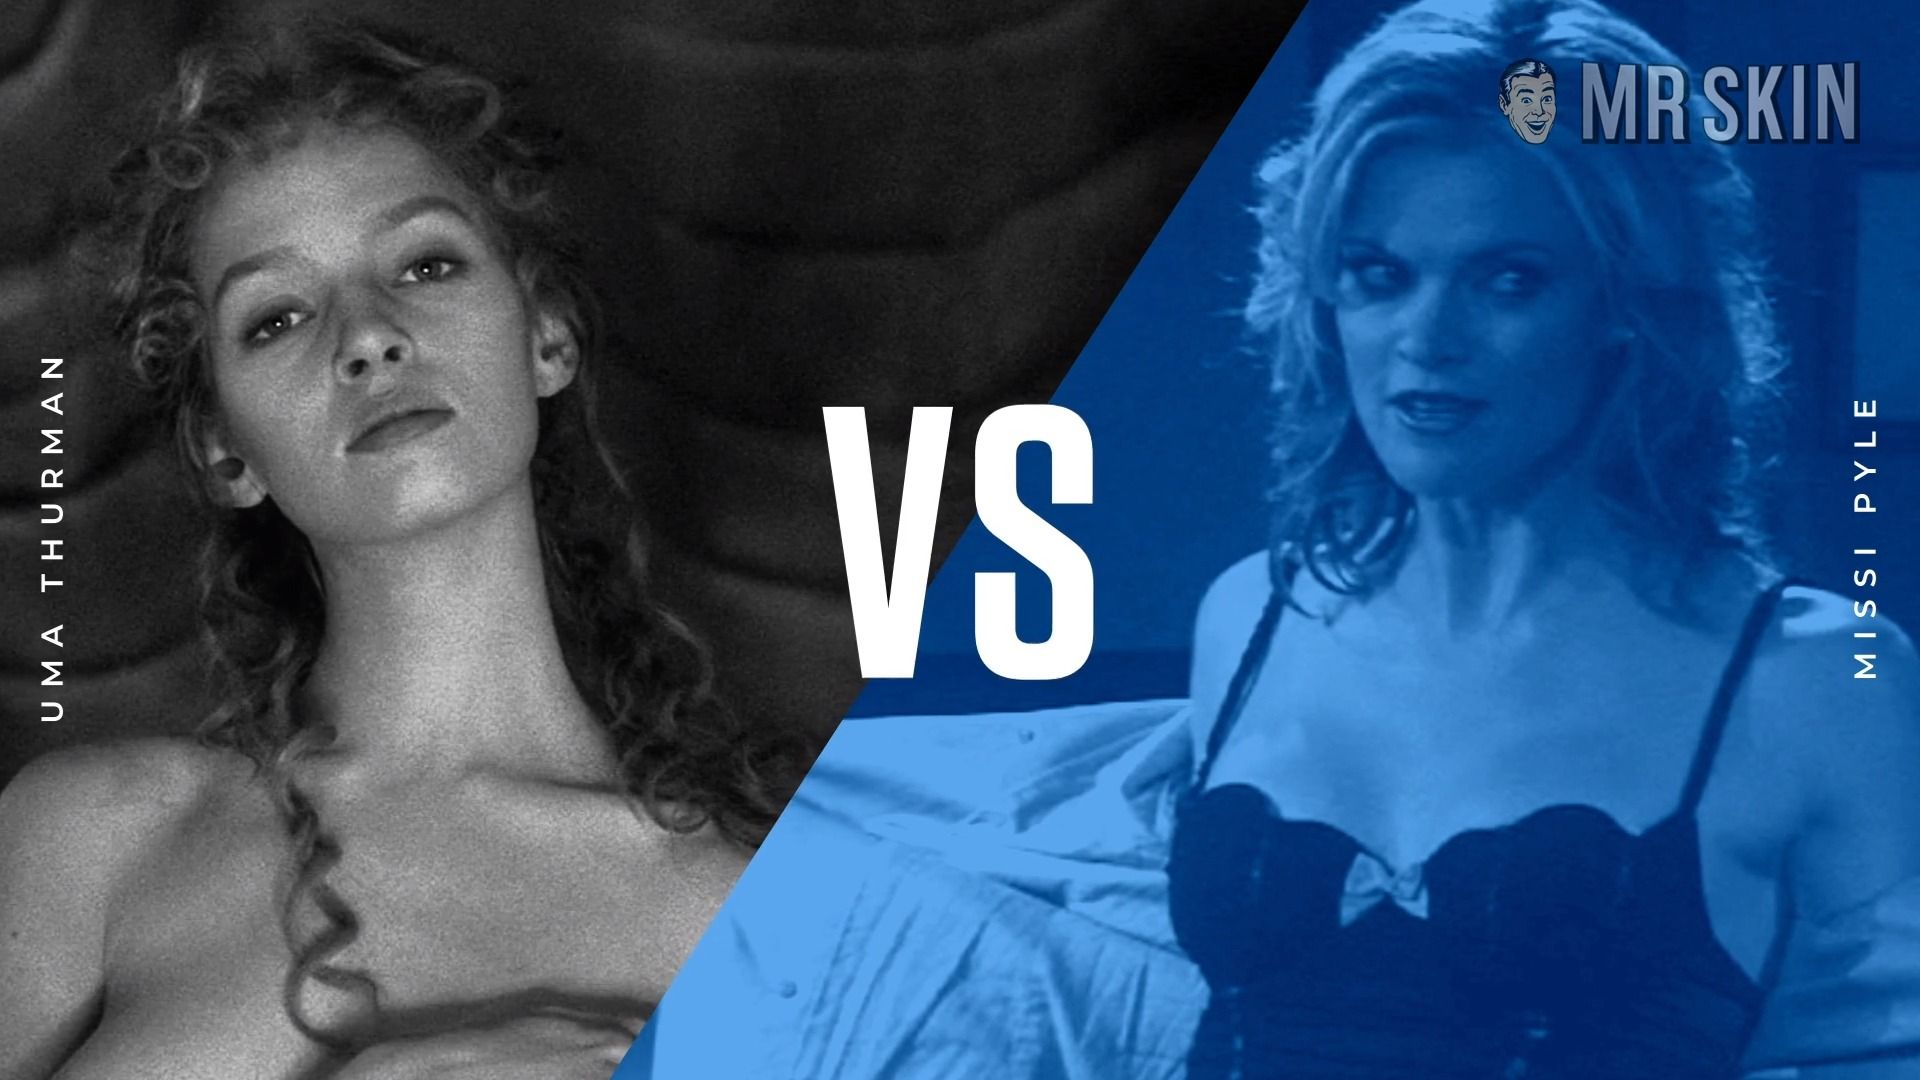 Battle of the Babes: Uma Thurman vs. Missi Pyle